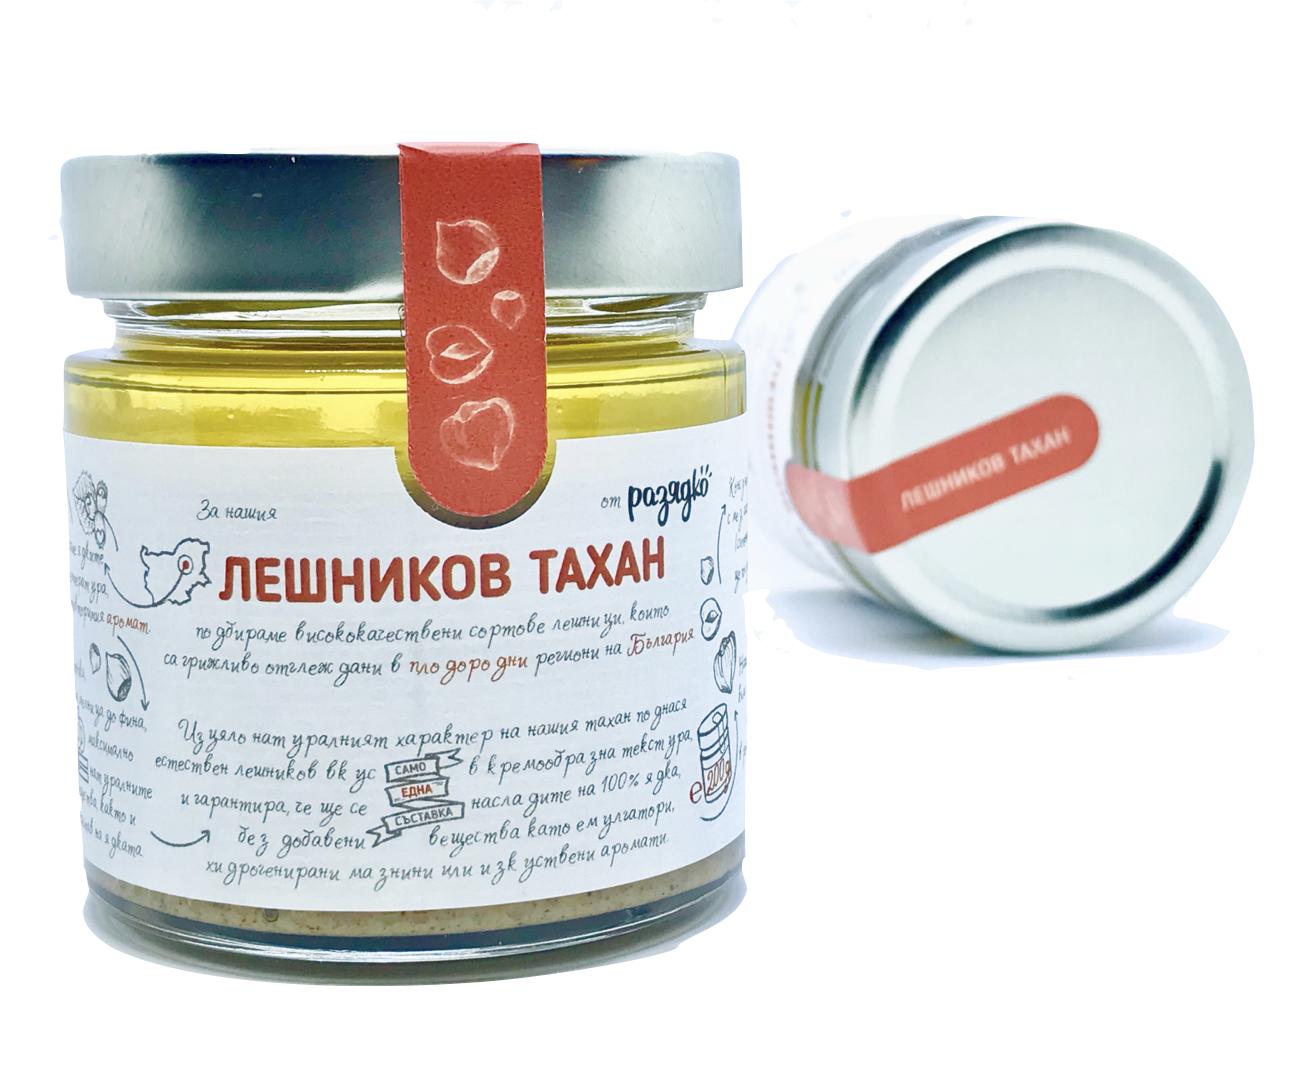 ЛЕШНИКОВ ТАХАН 200 g